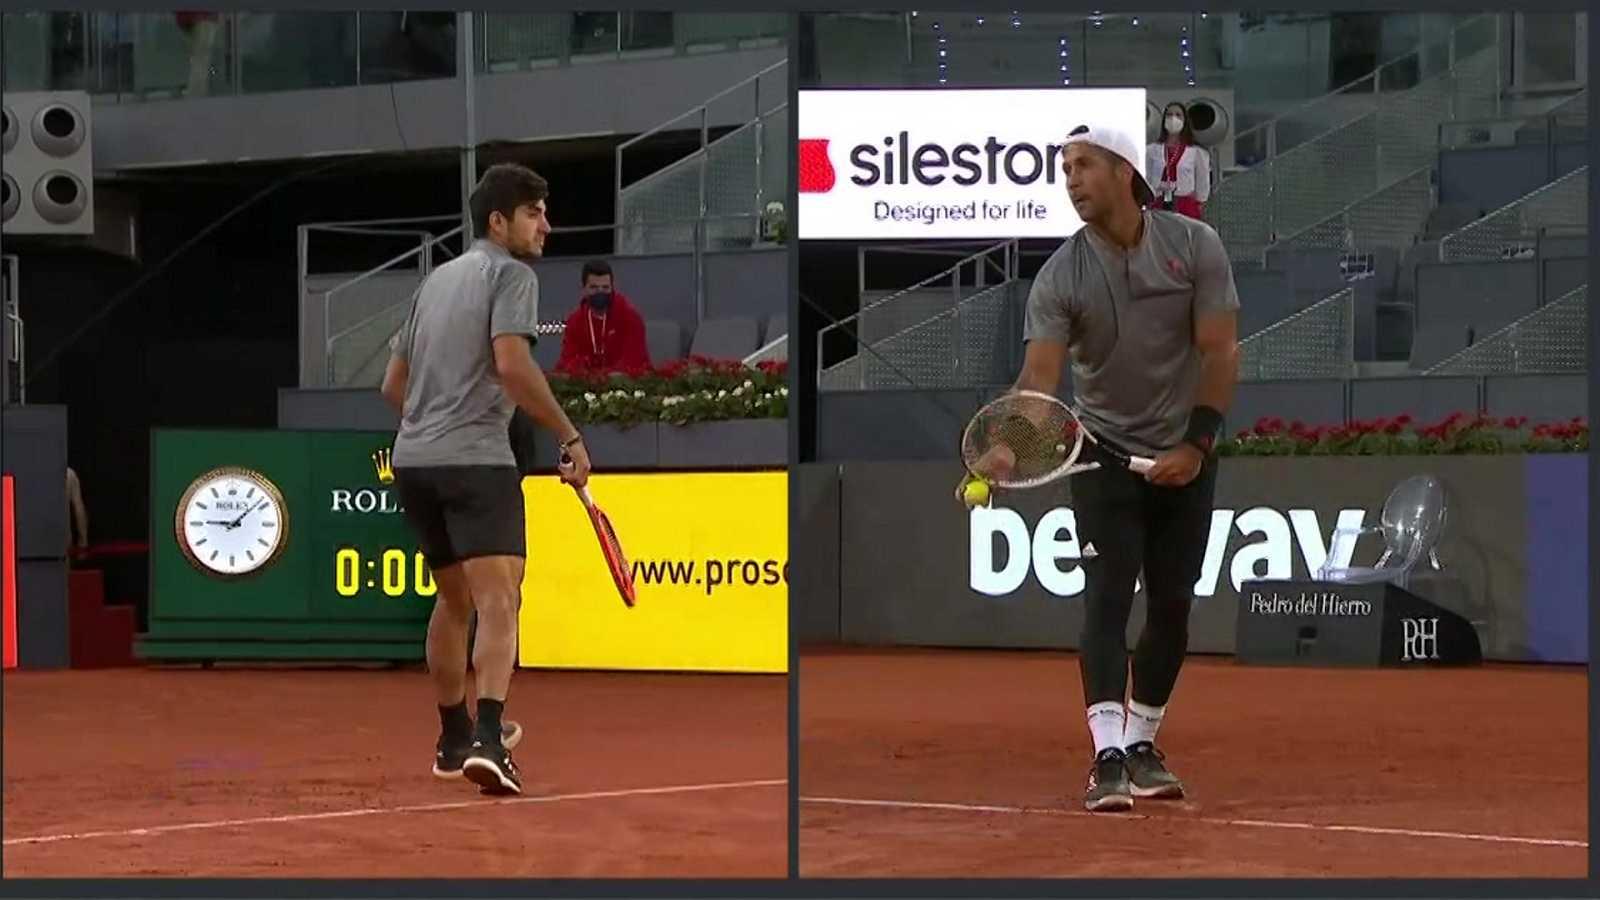 Tenis - ATP Mutua Madrid Open: C. Garín - F. Verdasco - ver ahora